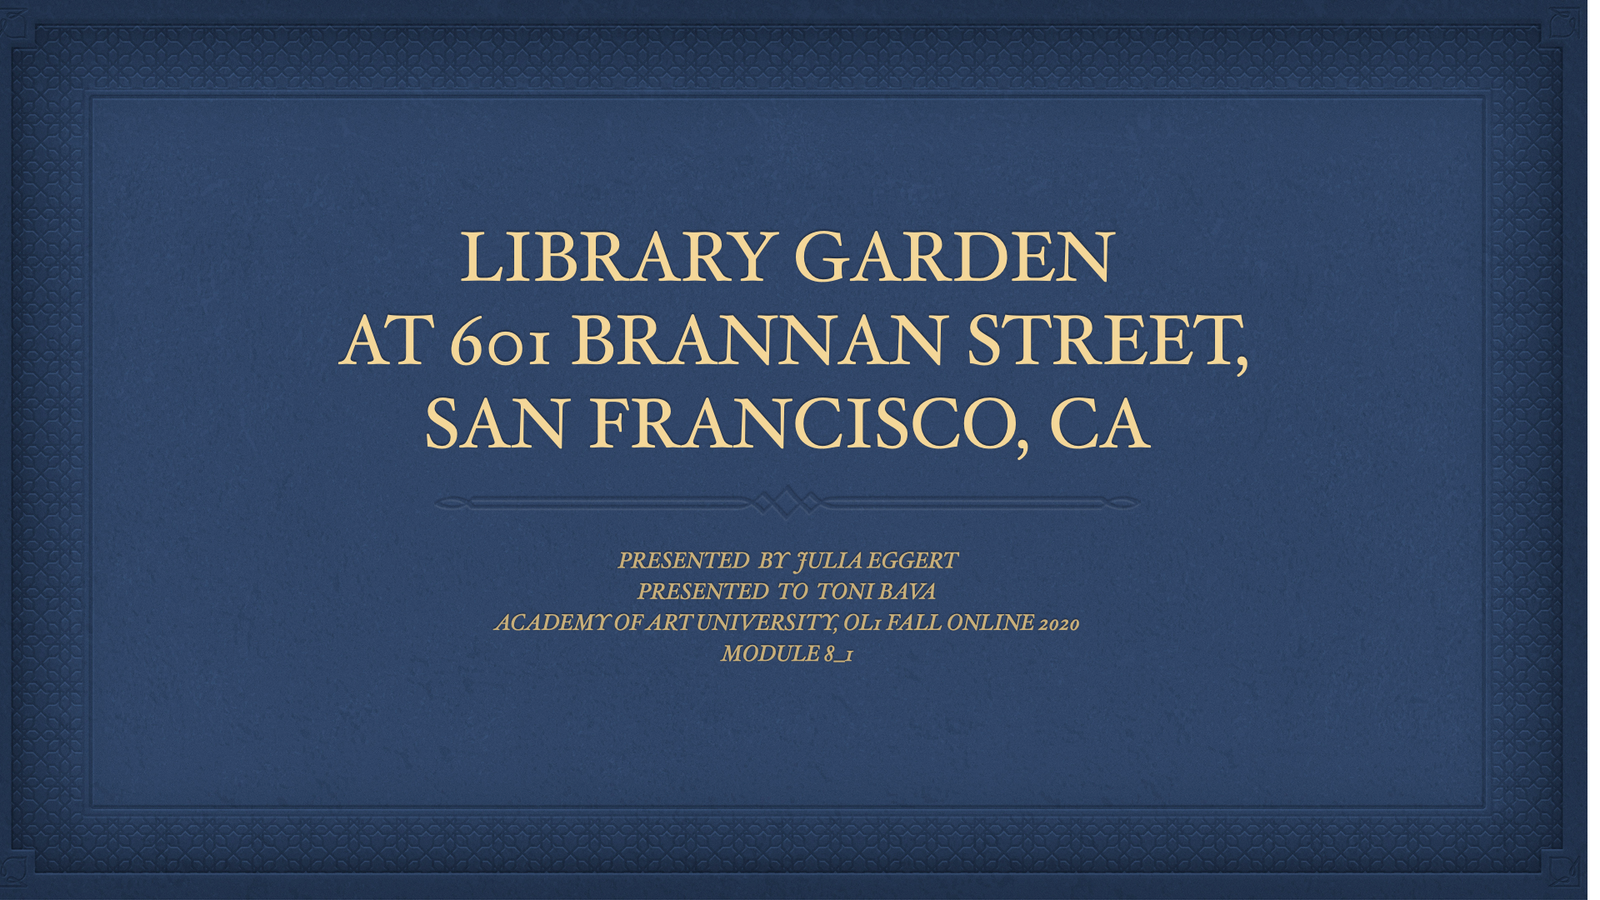 Library Garden for 601 Brannan Street Site 1